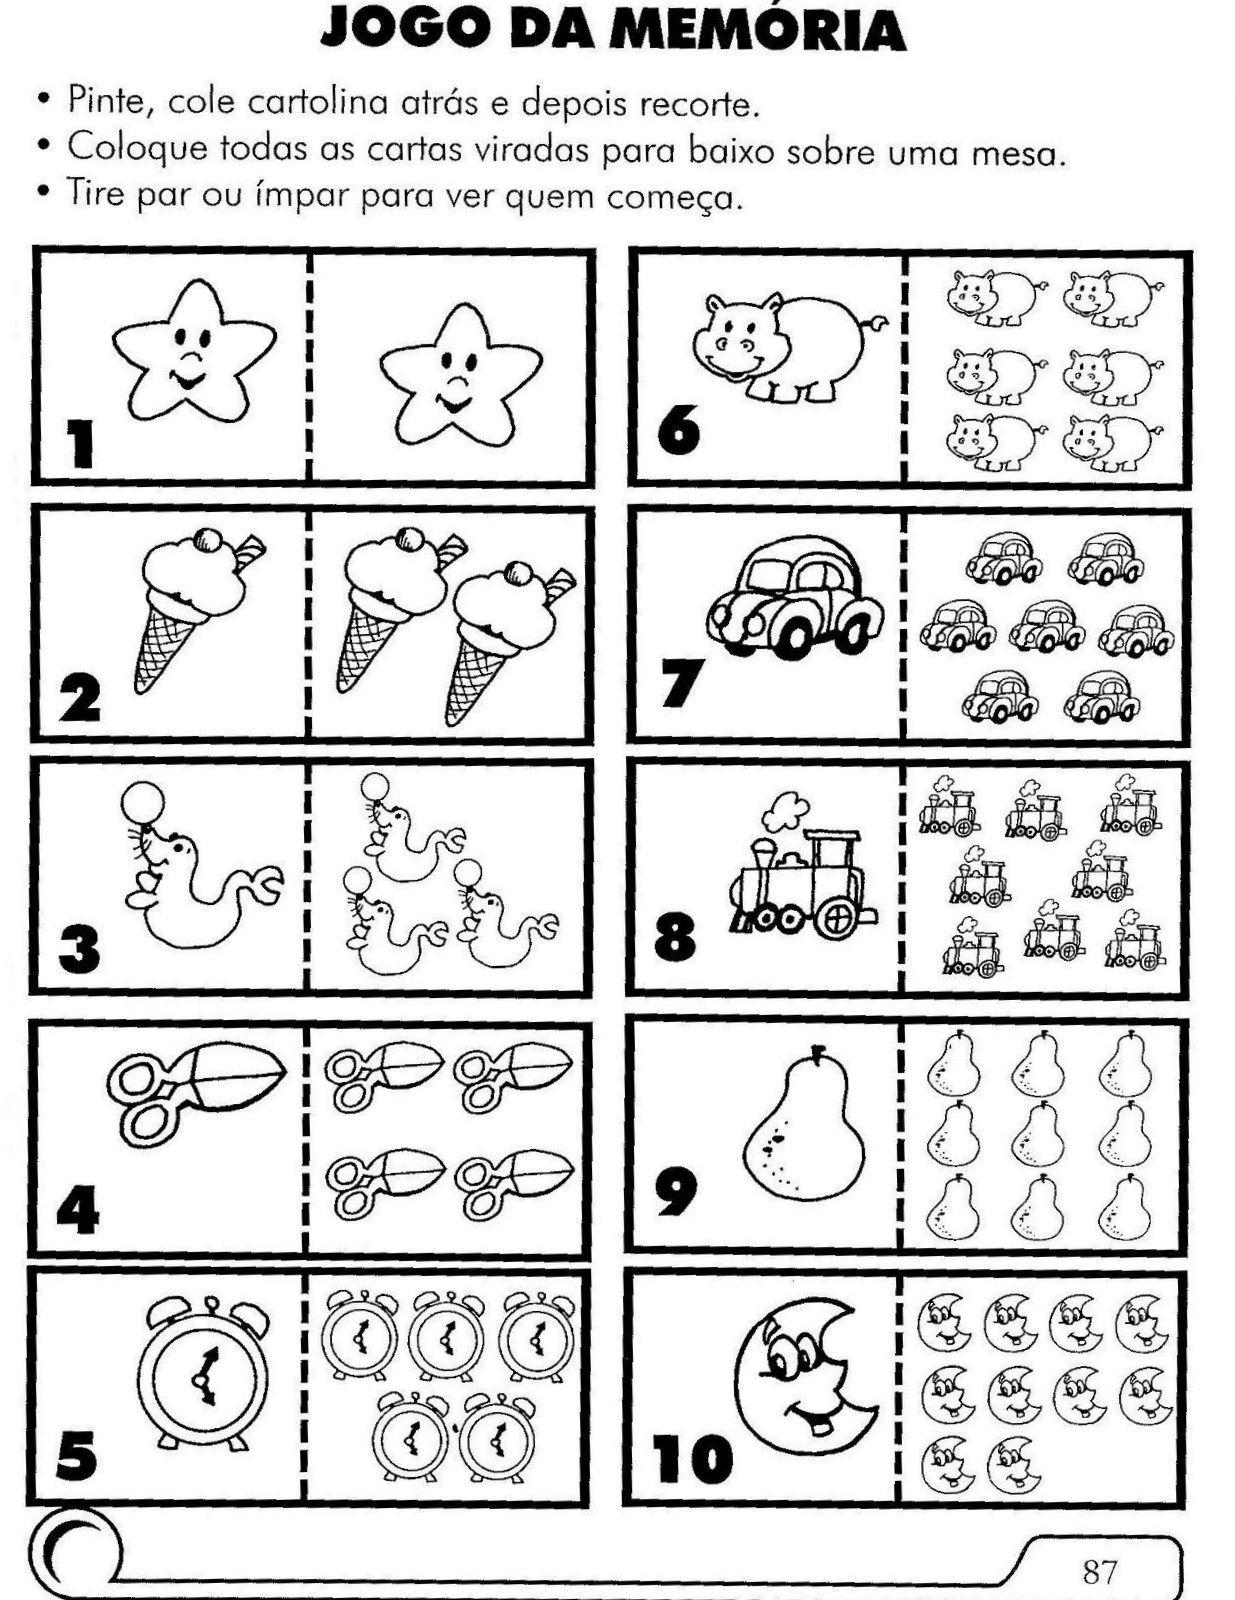 fancy numero 10 para colorir aprender a escrever numeros adornment